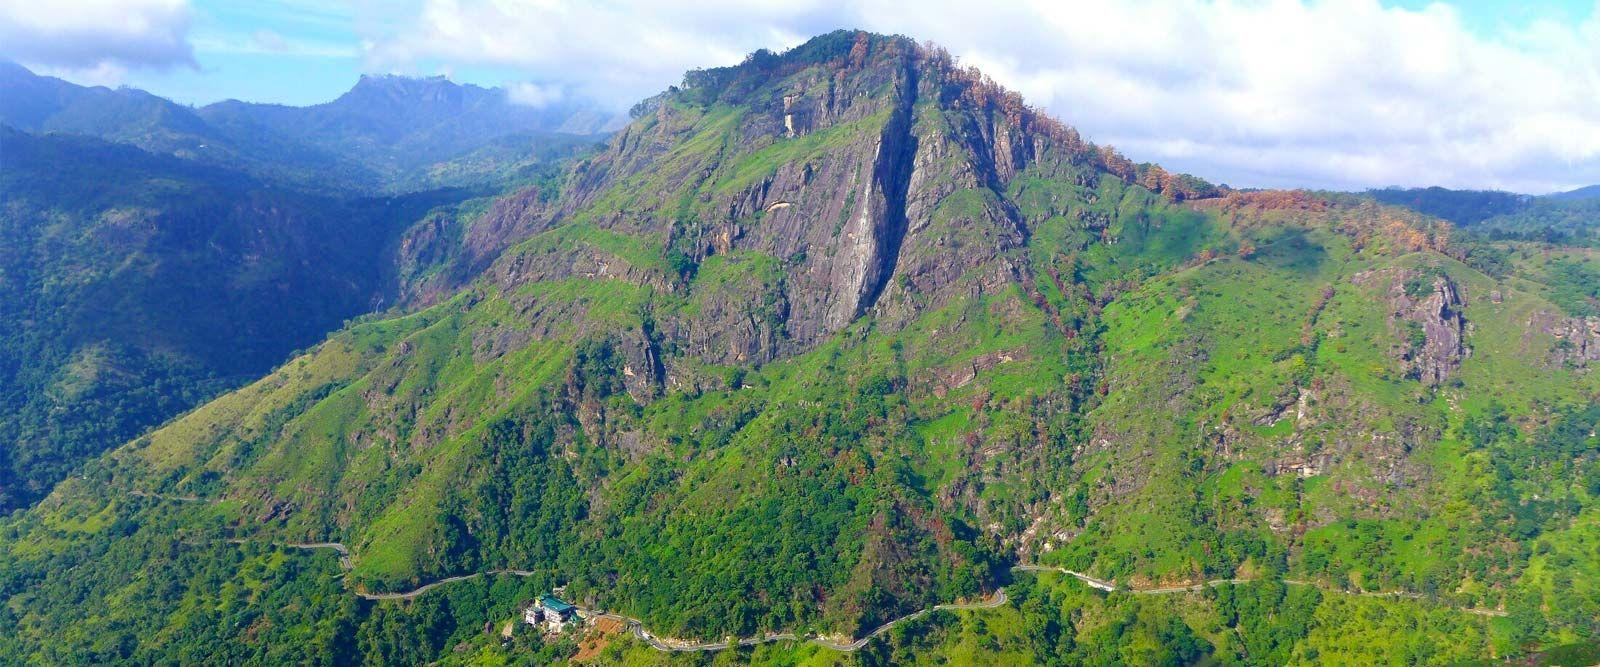 Ella Southern Hill Country of Sri Lanka